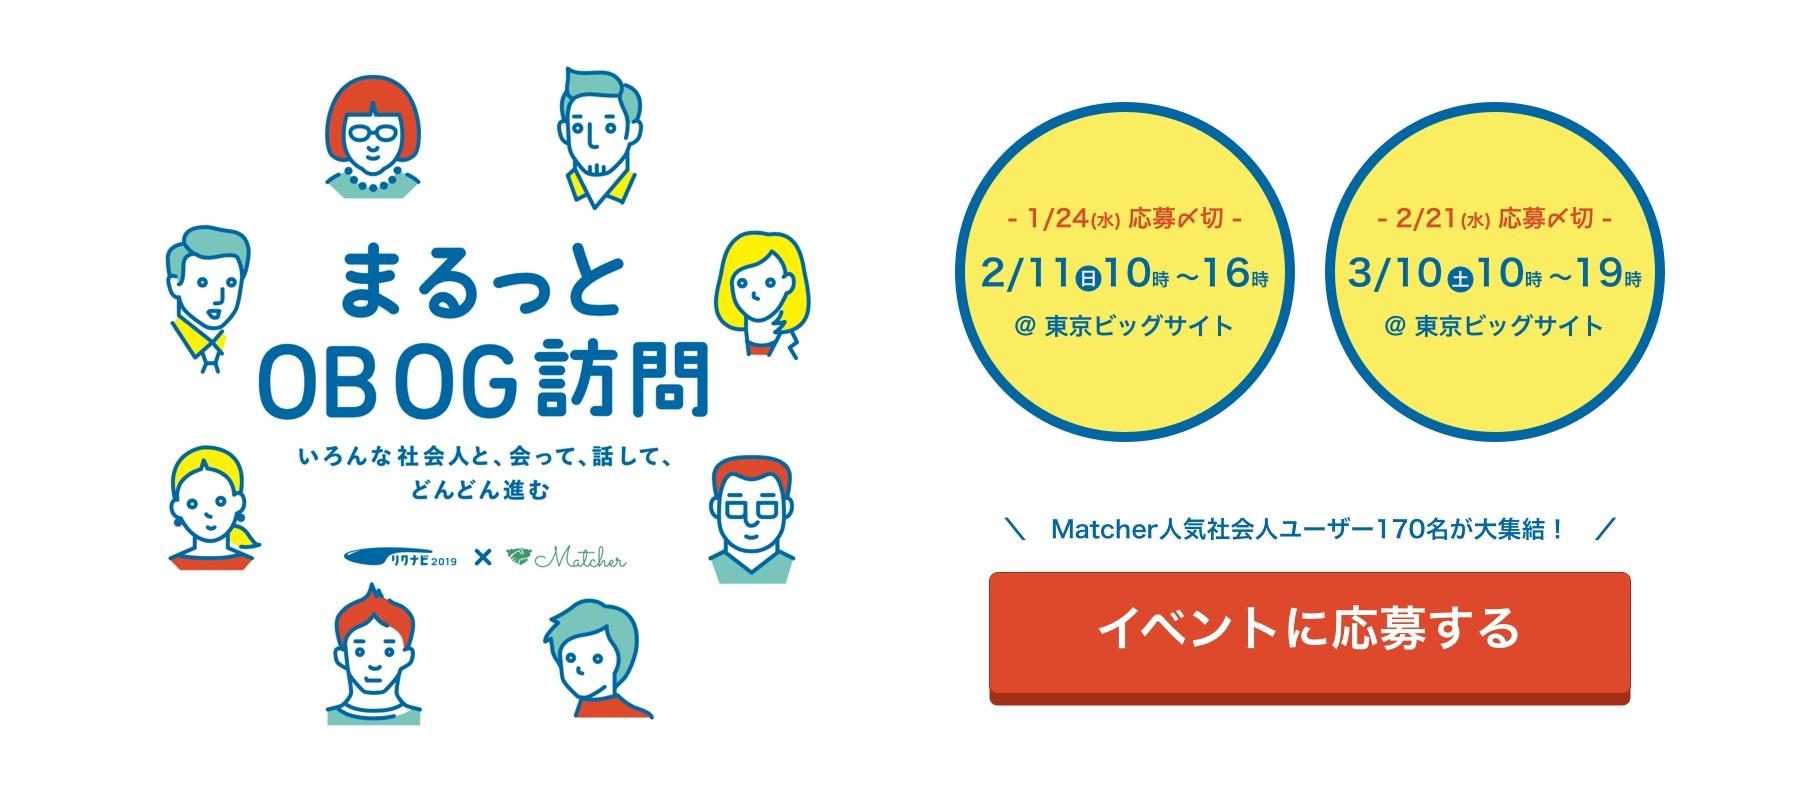 Matcherとリクルートキャリアが業務提携、史上最大級の『OBOG訪問イベント』を東京ビッグサイトで開催